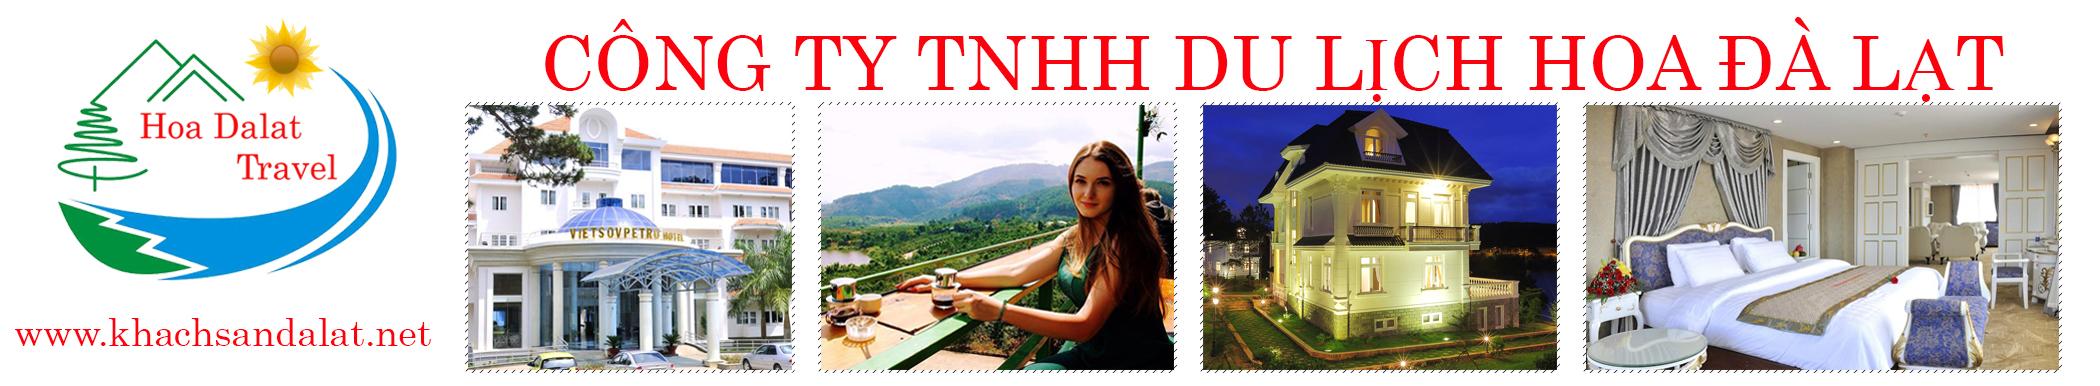 dalatcogihot.com